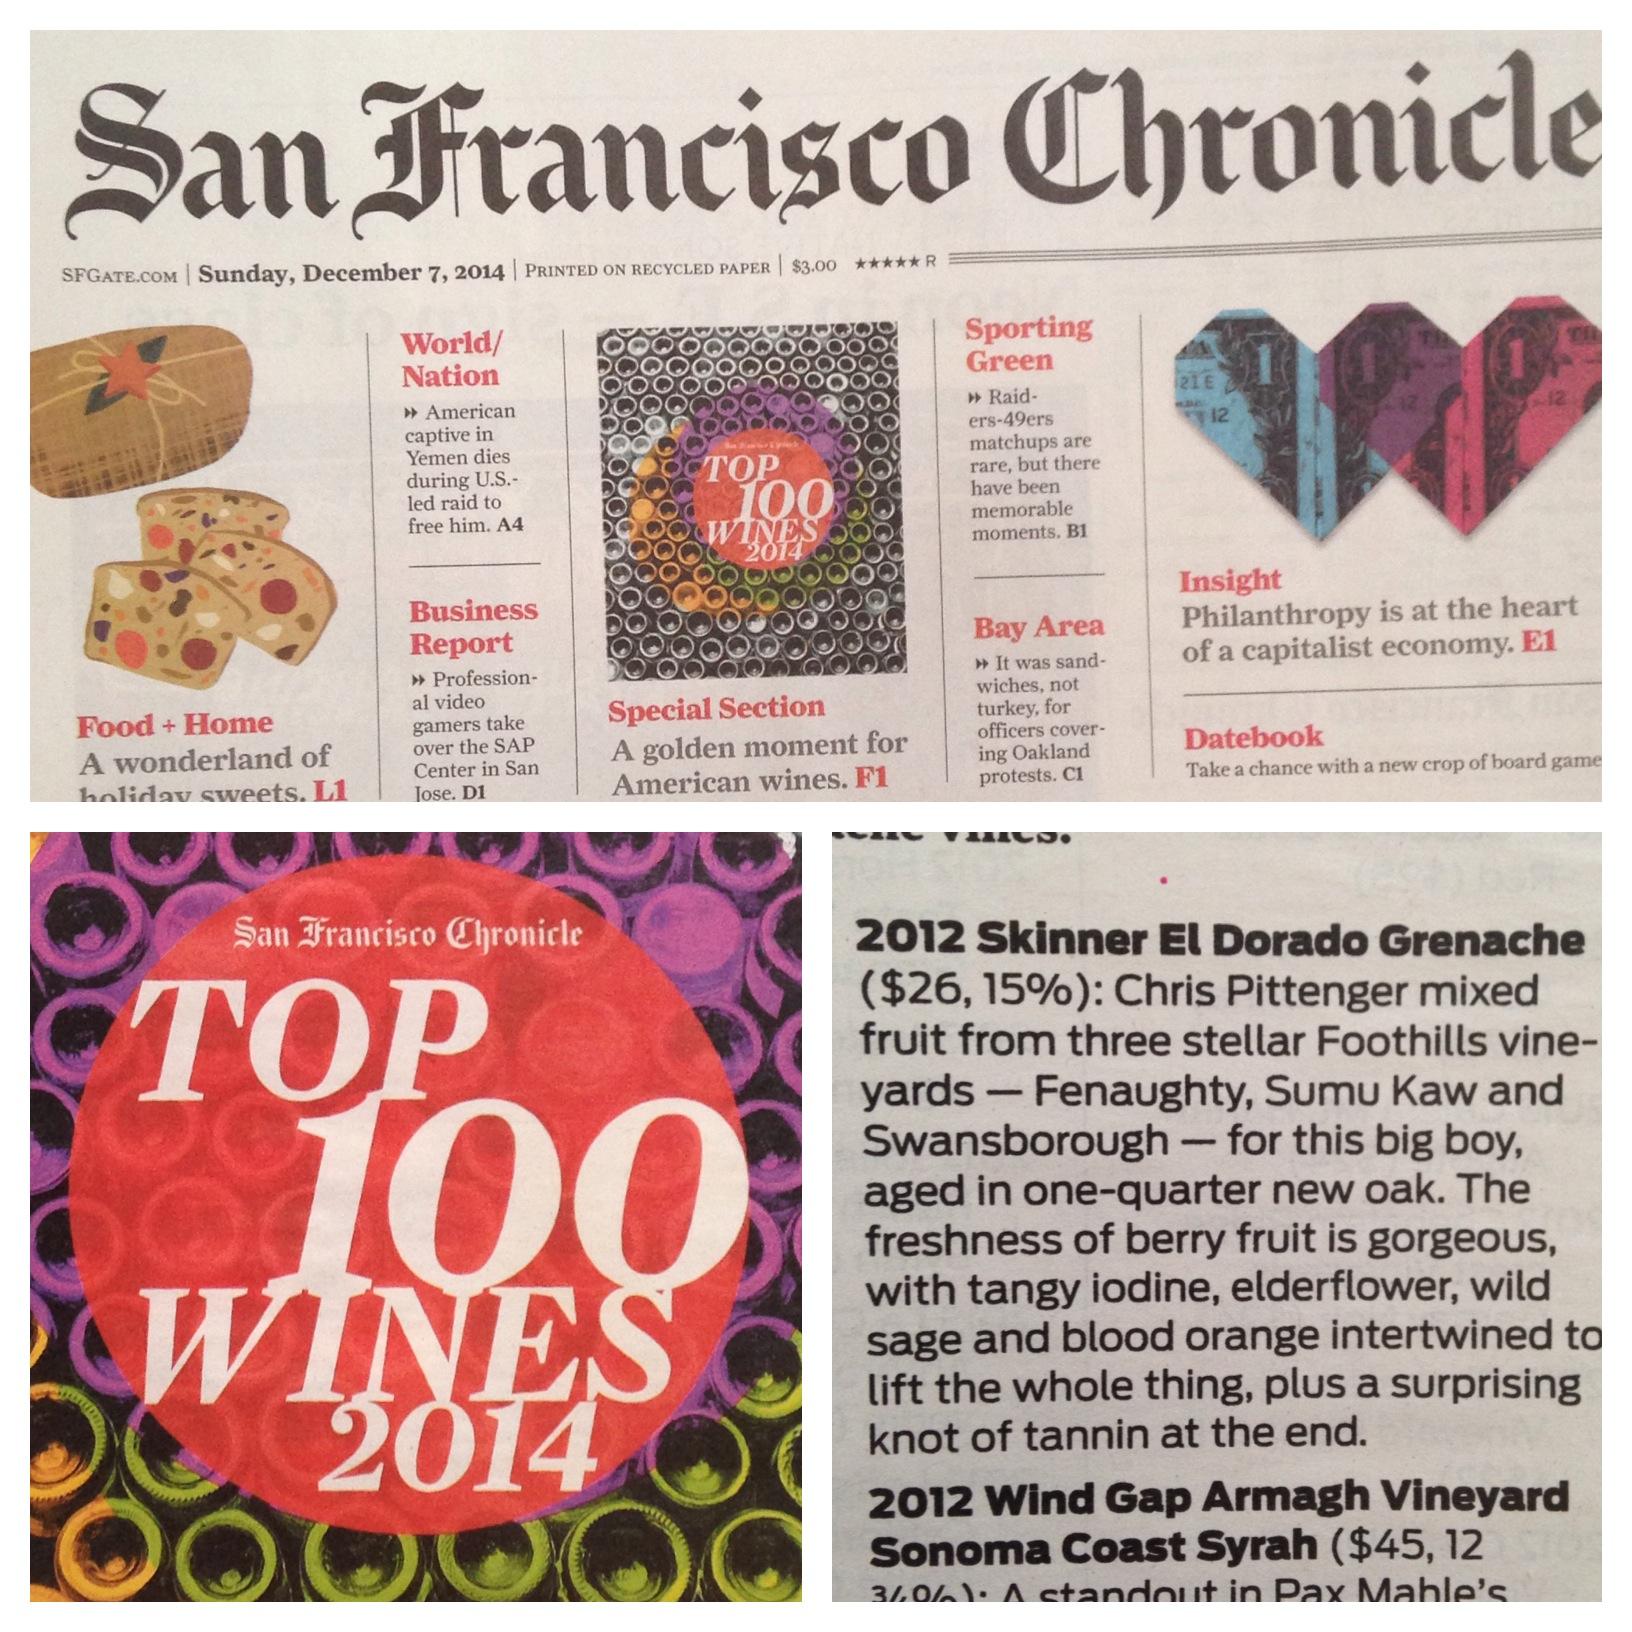 San Francsico Chronical Newspaper